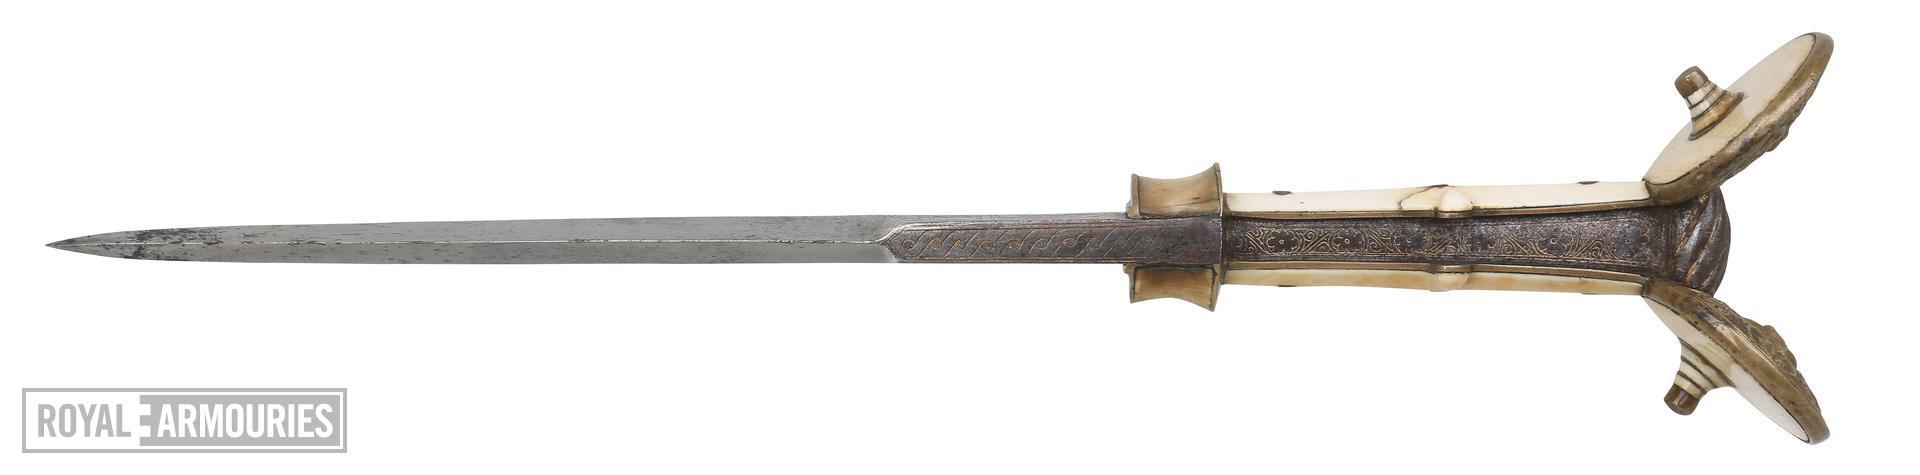 Ear dagger. Italian, 16th century. X.258